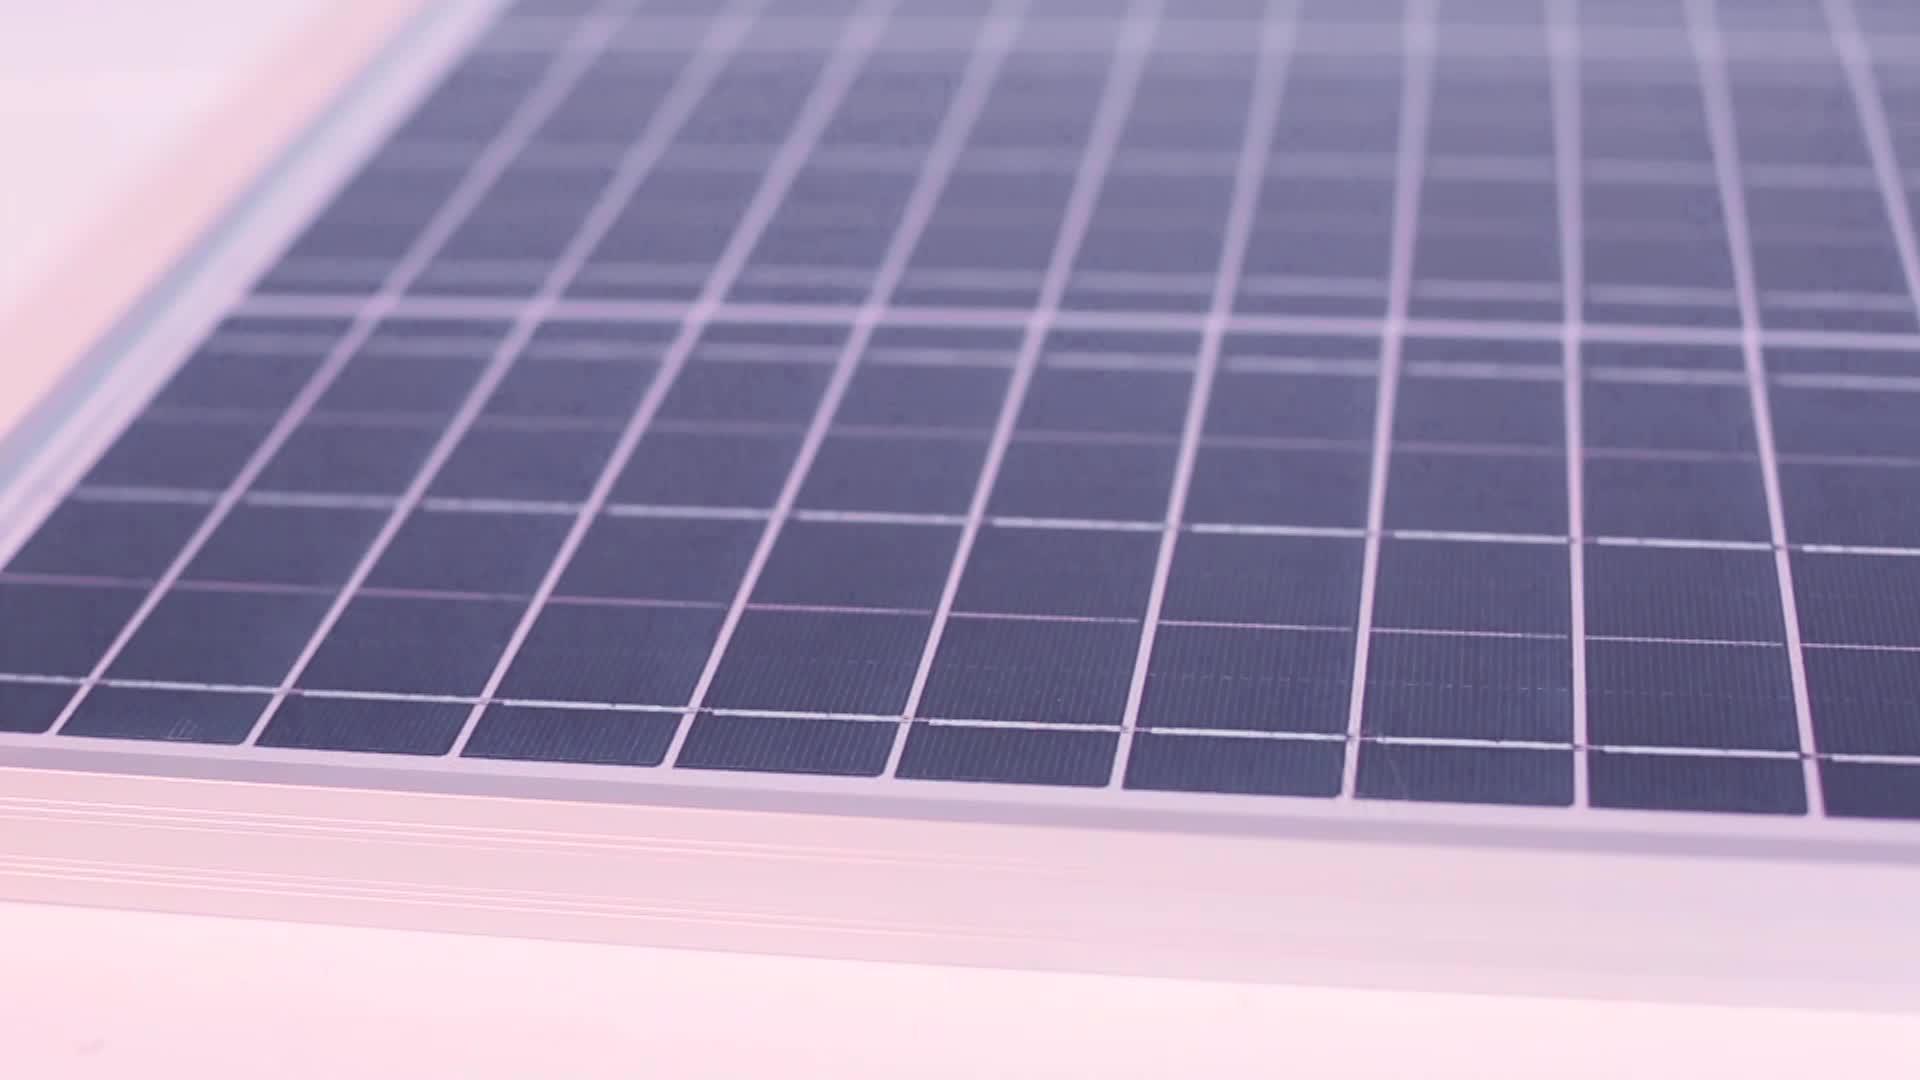 Goosun Energi 2019 Panas Dijual 327 W Sunpower Panel Tenaga Surya/Solar Panel 330 W 340 W 345 W 350 W 36 V panel Tenaga Surya/Solar Panel Canadian Solar Panel 330 W Harga